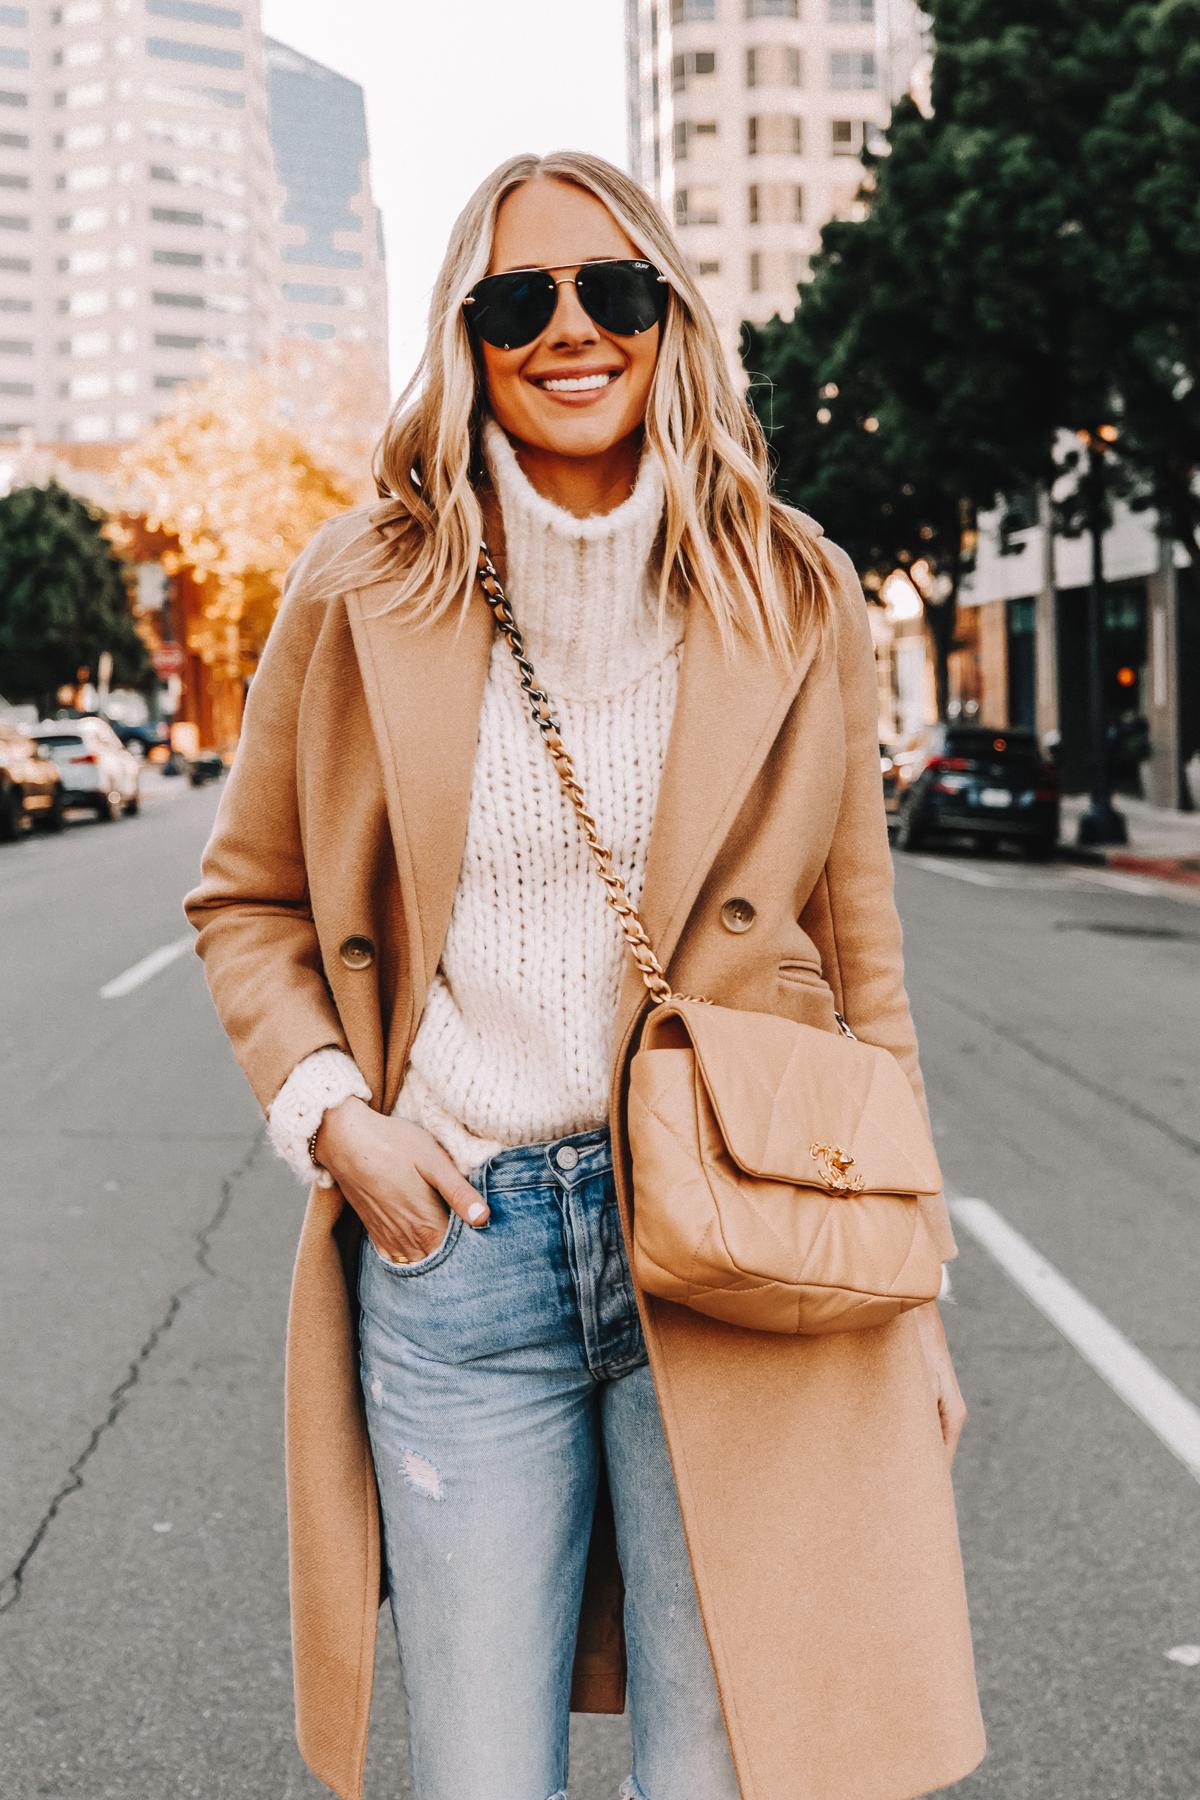 Fashion Jackson Wearing Everlane Camel Coat White Turtleneck Sweater Ripped JEans Chanel 19 Beige Handbag